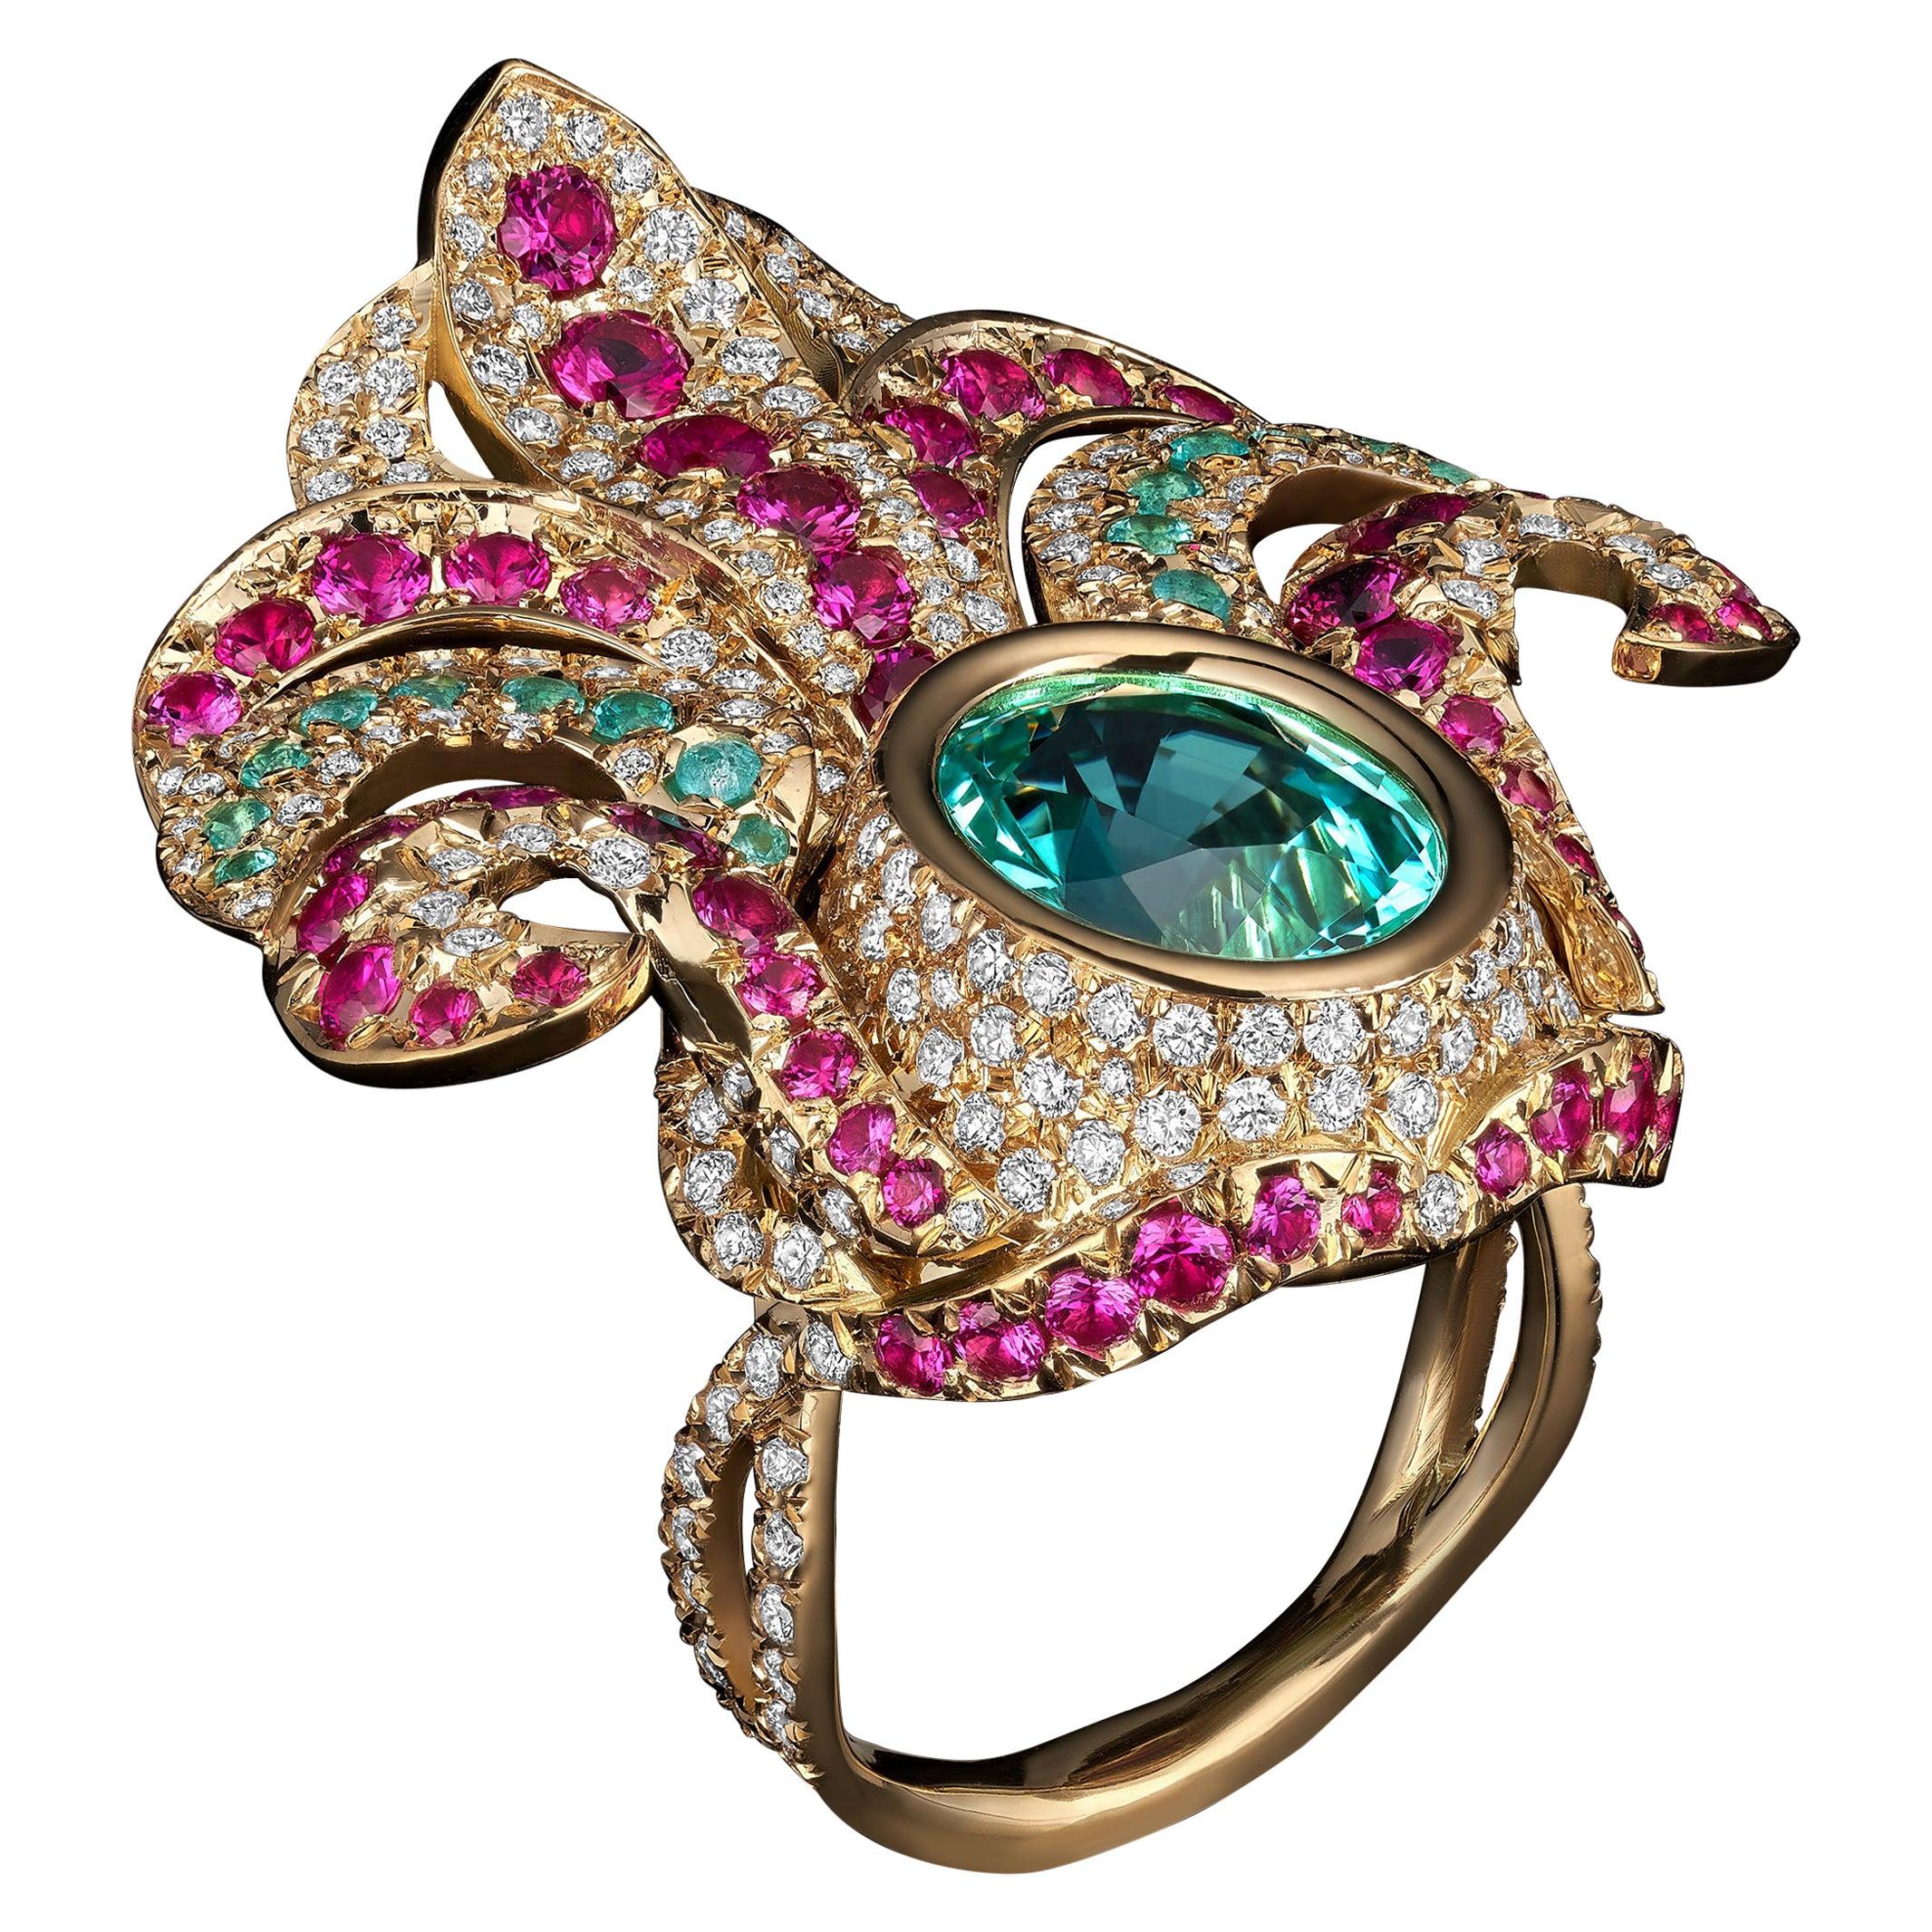 18K Gold GIA Certified 8.2 Carat Paraiba Tourmaline Rubies Diamond Cocktail Ring